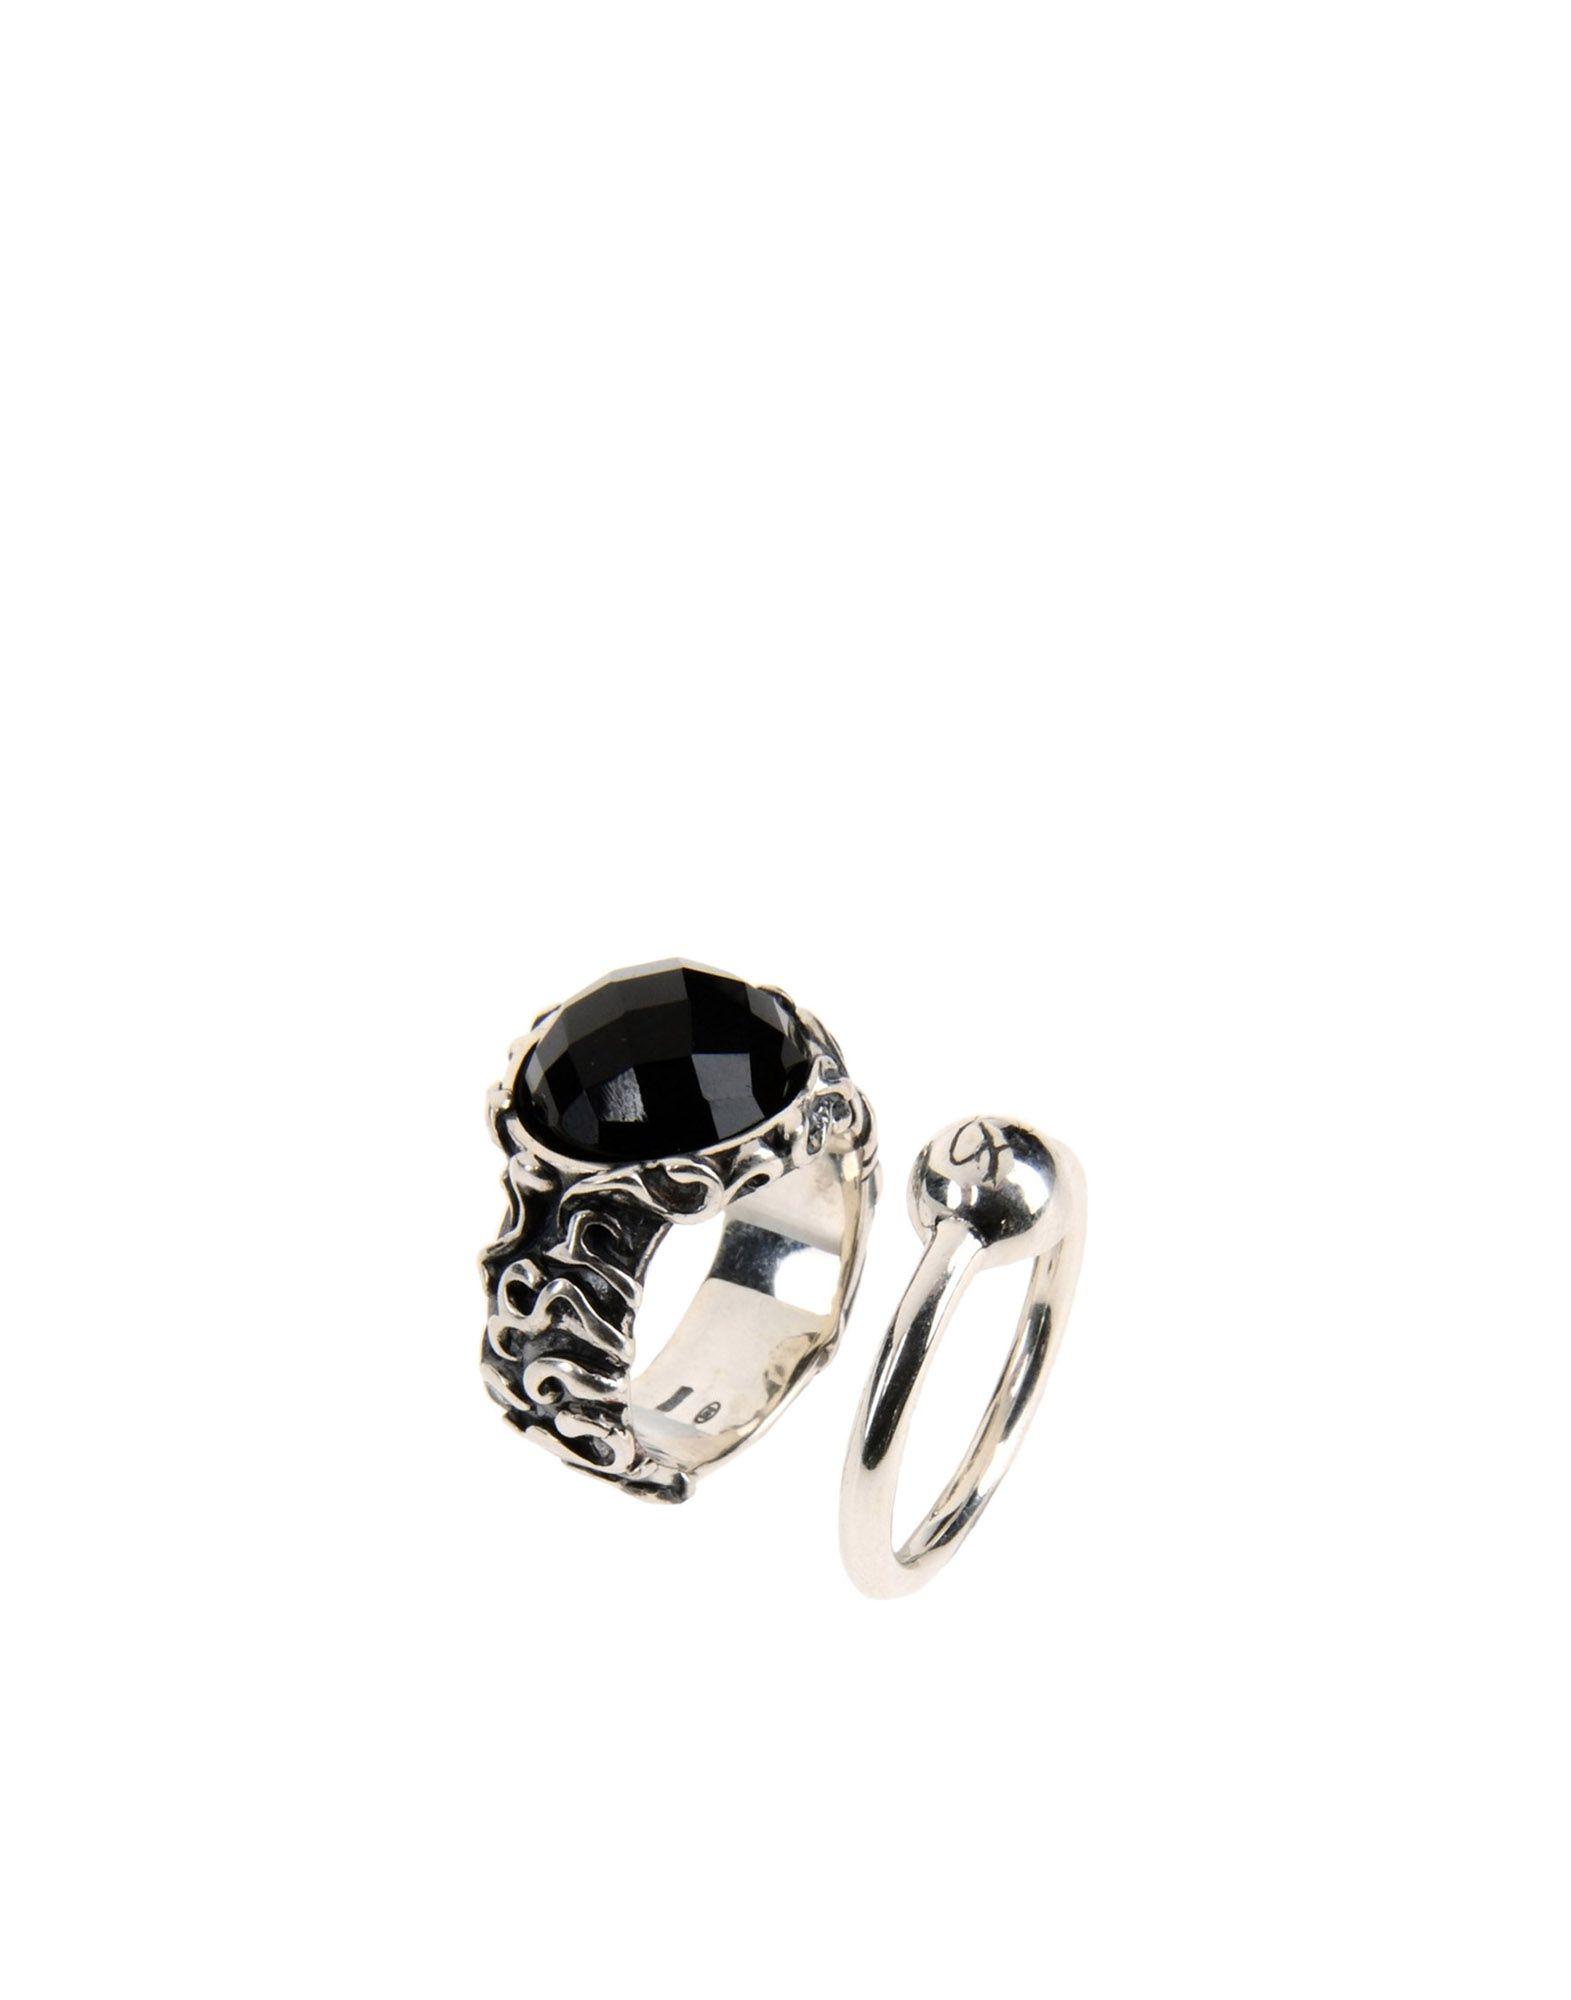 MANUEL BOZZI Ring in Maroon